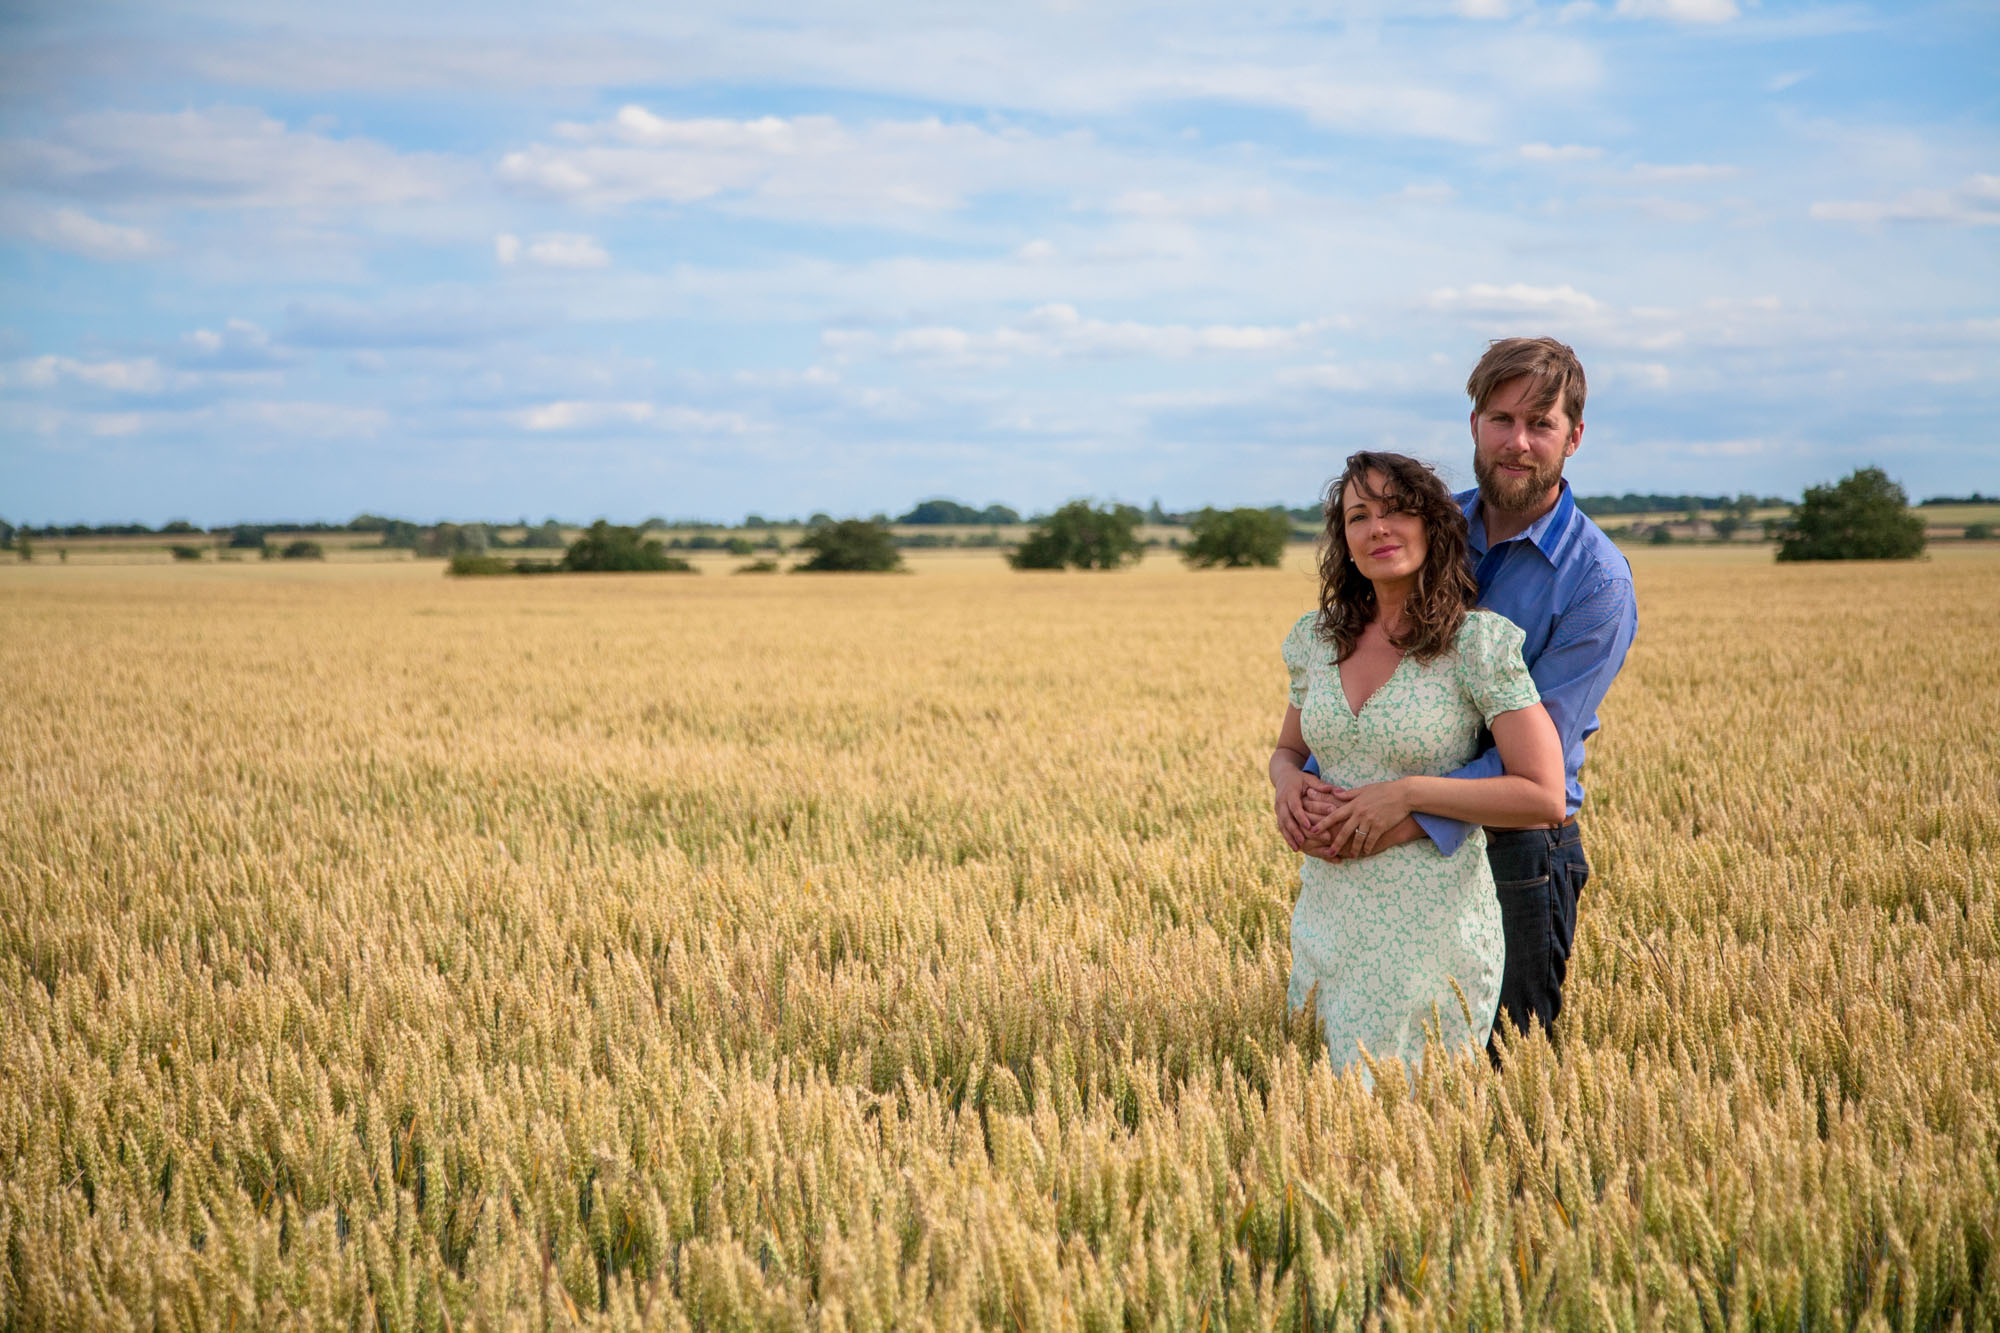 engagements-couples-love-photographer-oxford-london-jonathan-self-photography-21.jpg